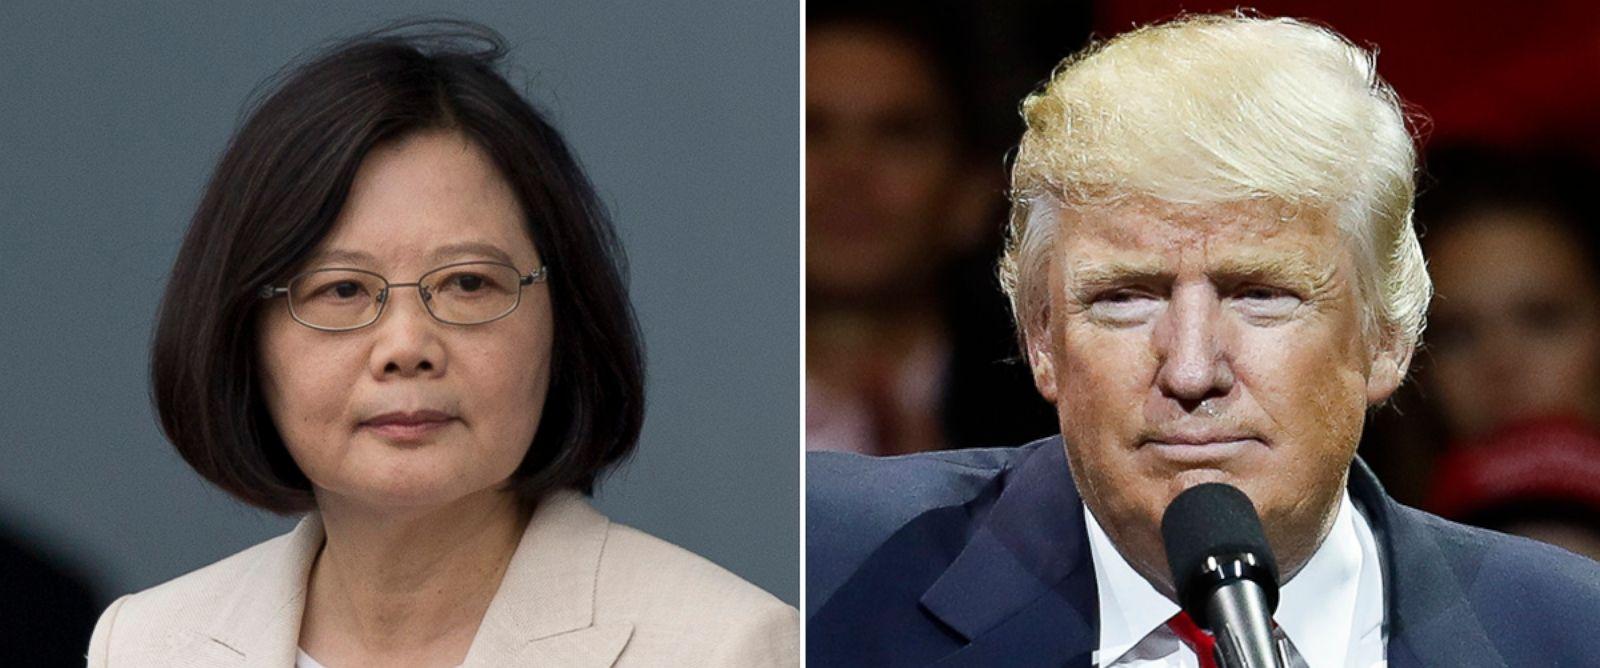 PHOTO: Taiwan President Tsai Ying-wen in Taipei, Taiwan, May 20, 2016; President-elect Donald Trump in Cincinnati, Dec. 1, 2016.